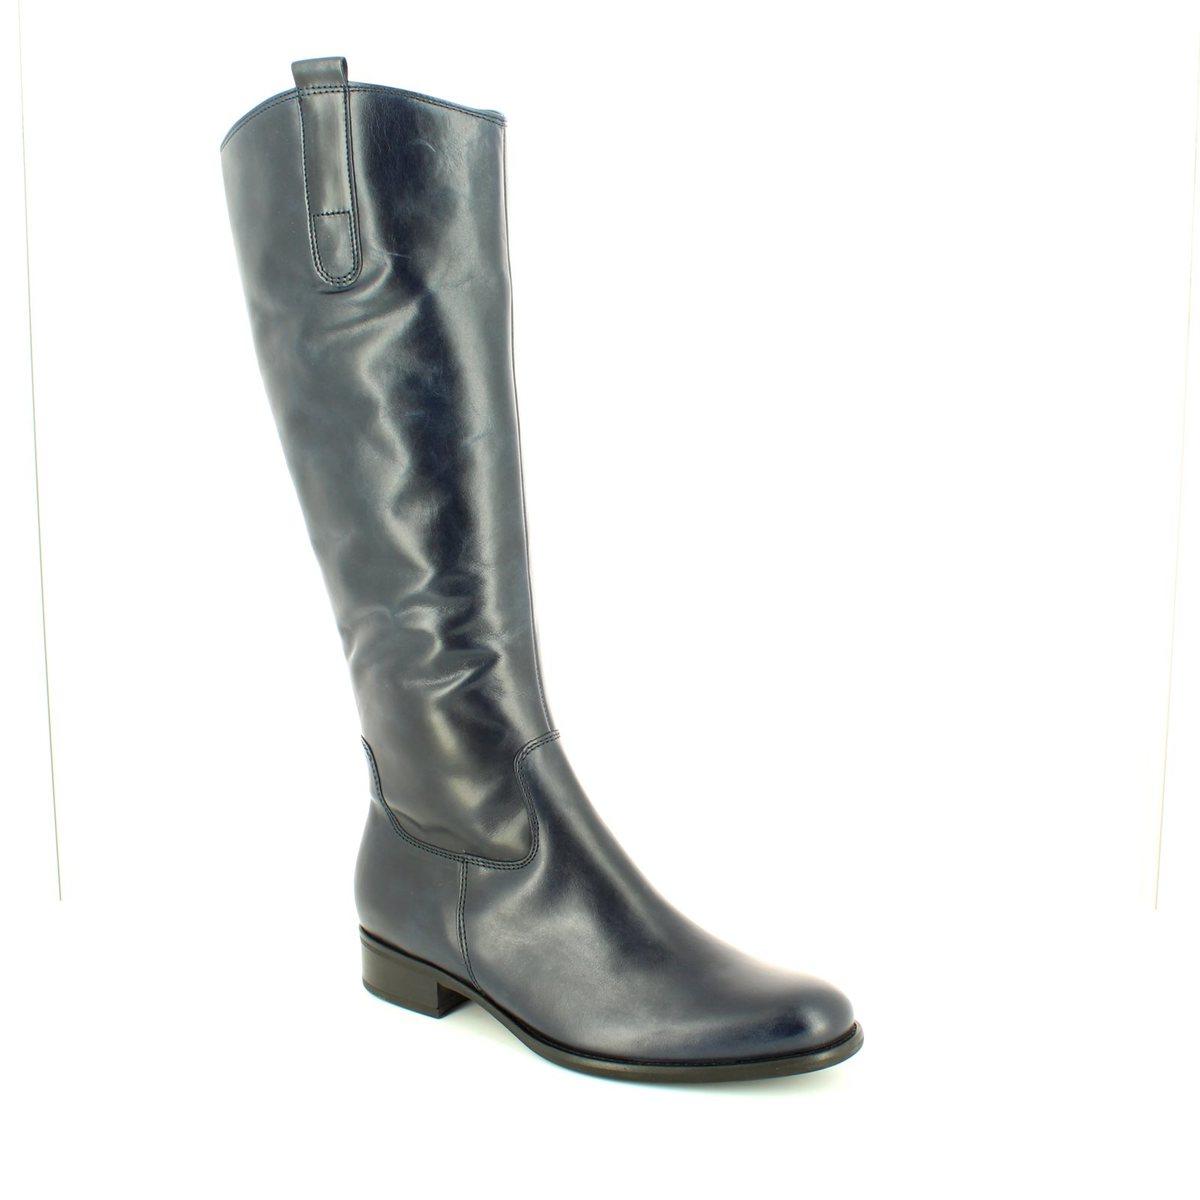 3152c0fc445 51.649.36 Brook Med Leg at Begg Shoes & Bags